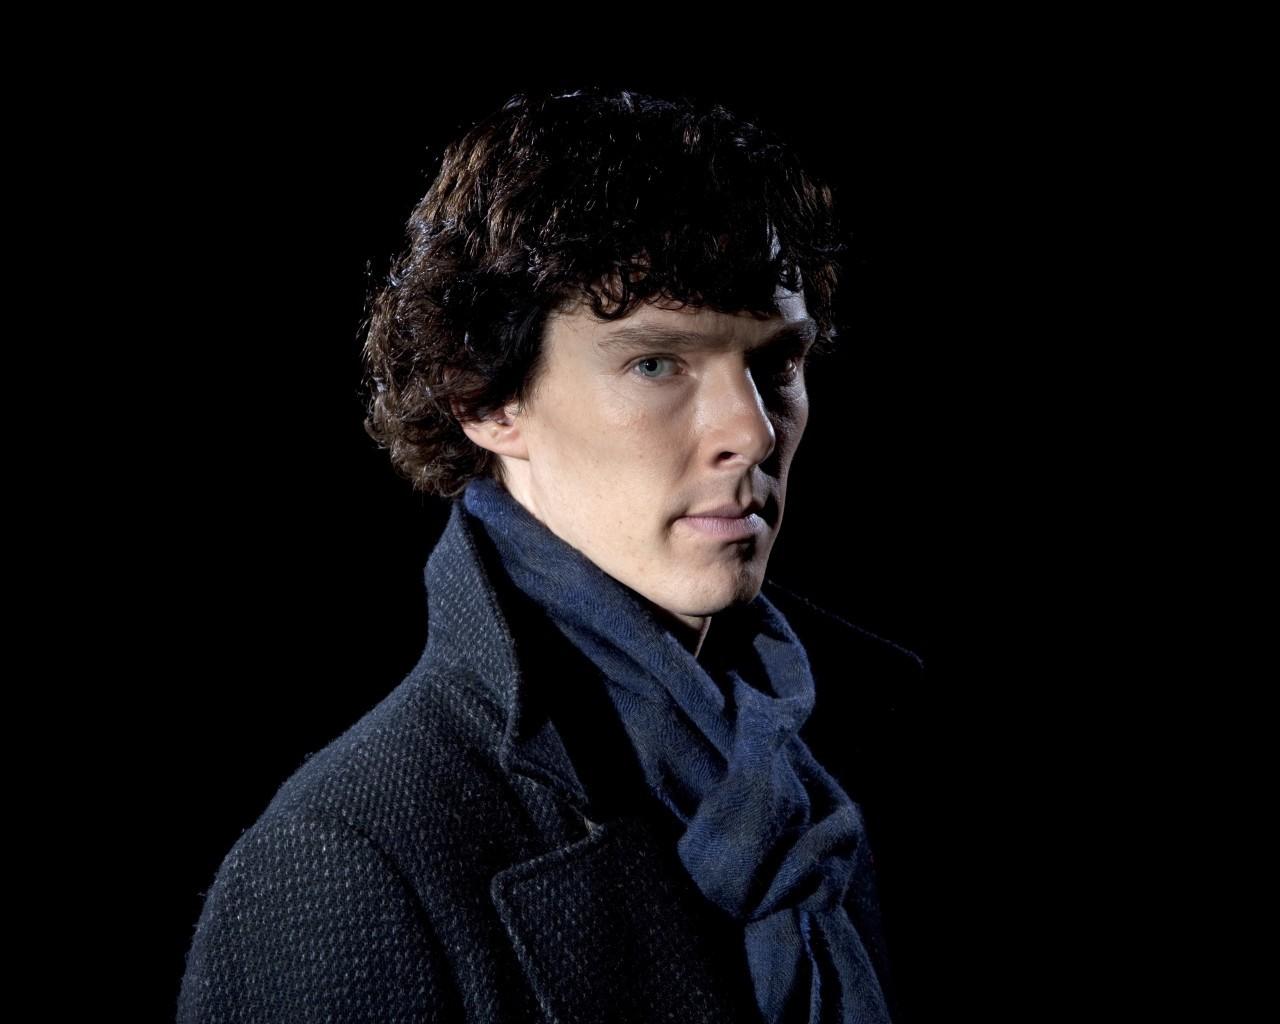 31775 download wallpaper Cinema, People, Actors, Men, Sherlock, Benedict Cumberbatch screensavers and pictures for free